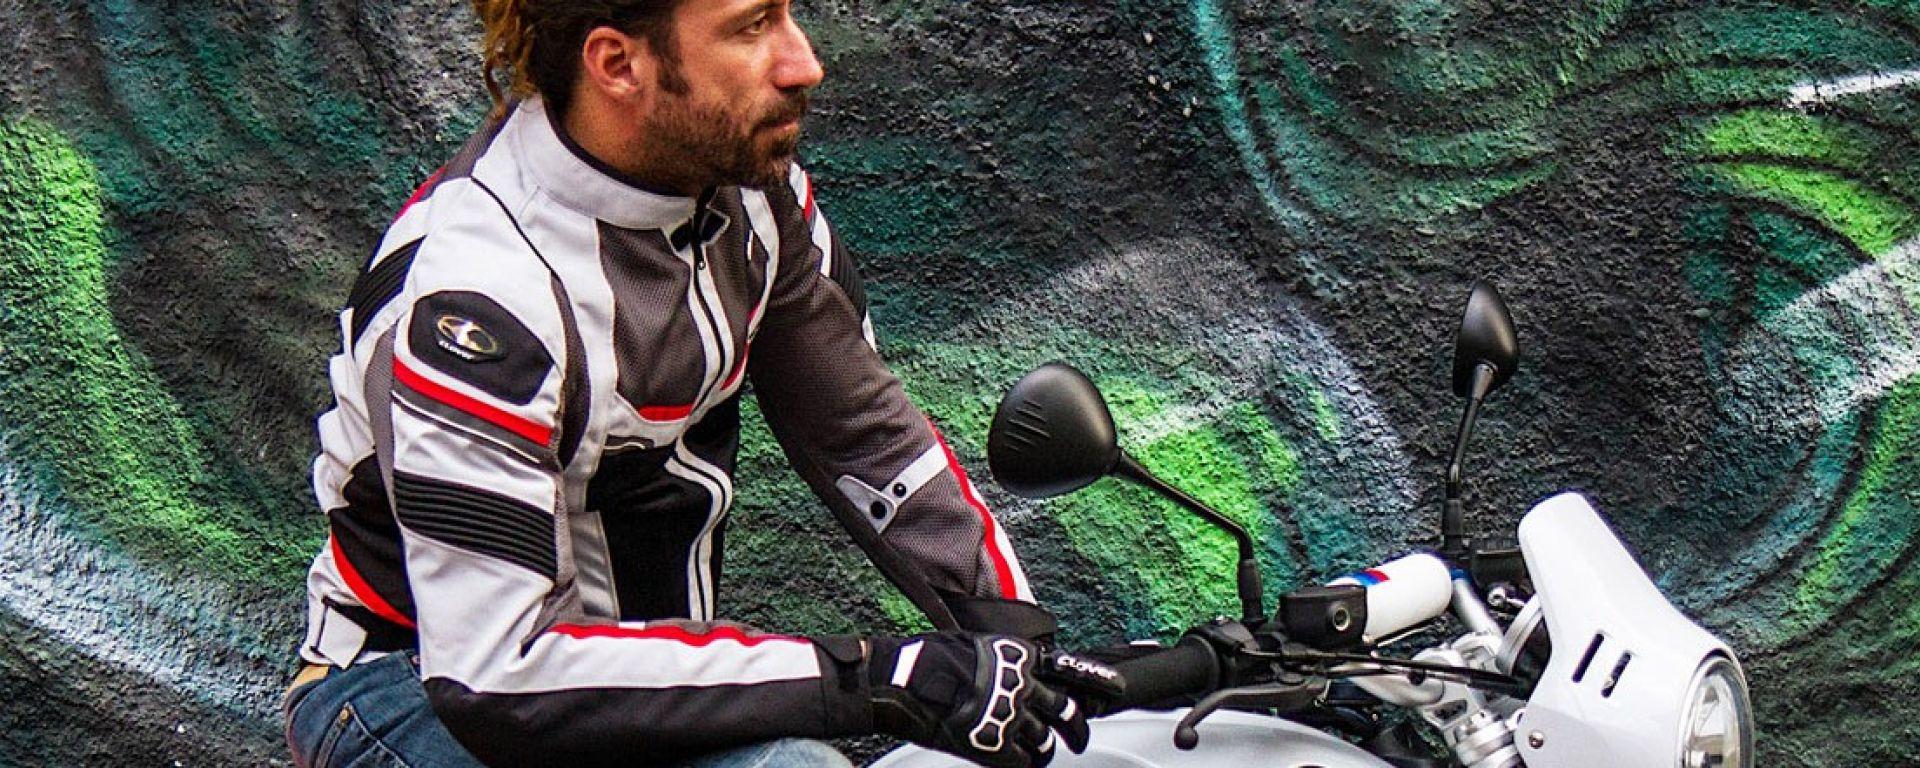 Clover Rainjet: giacca ventilata e impermeabile per l'estate